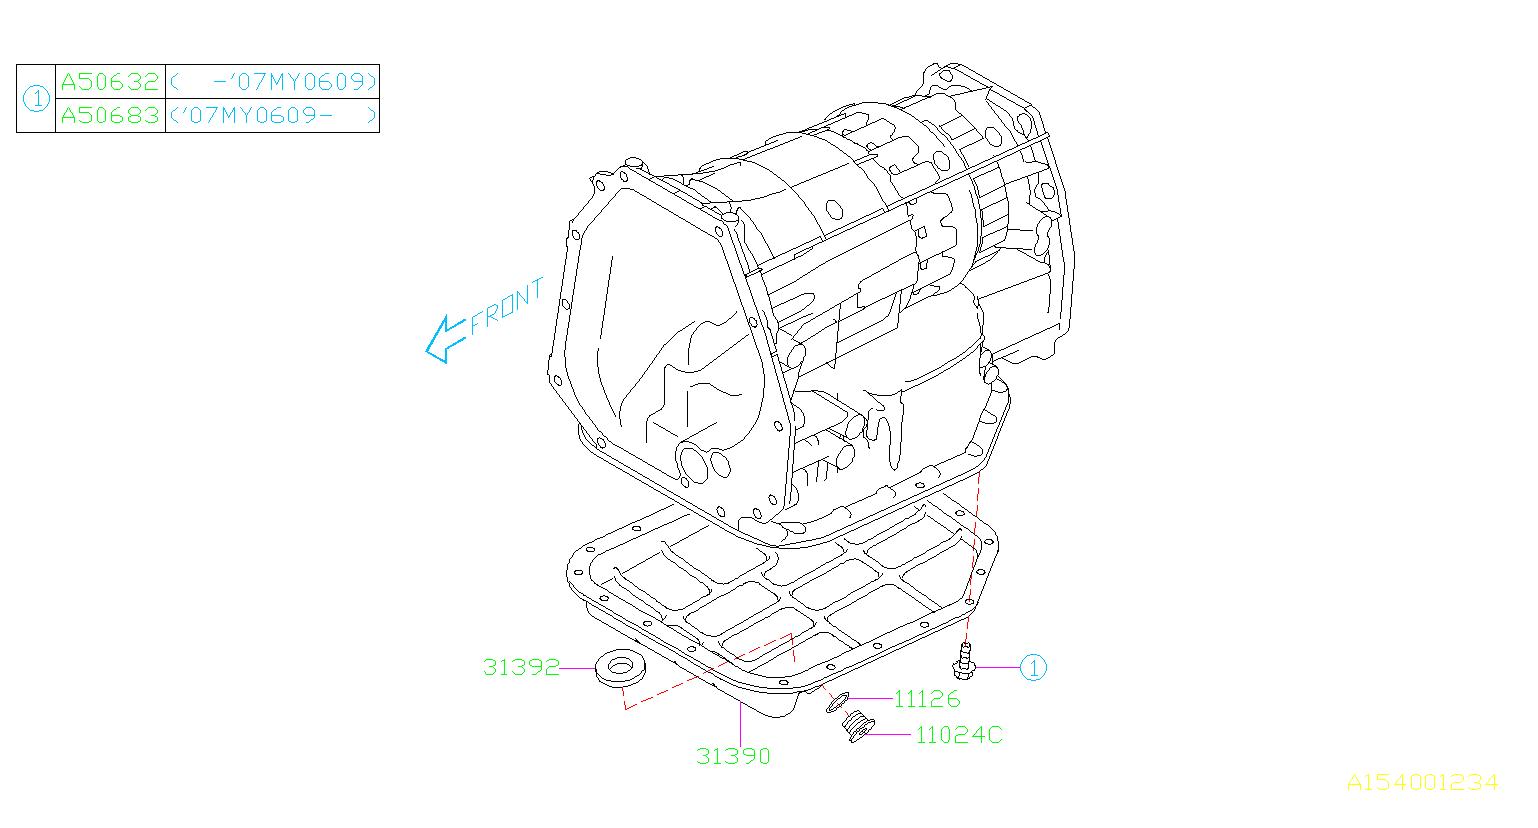 2008 Subaru Outback Plug. Case, converter, transmission